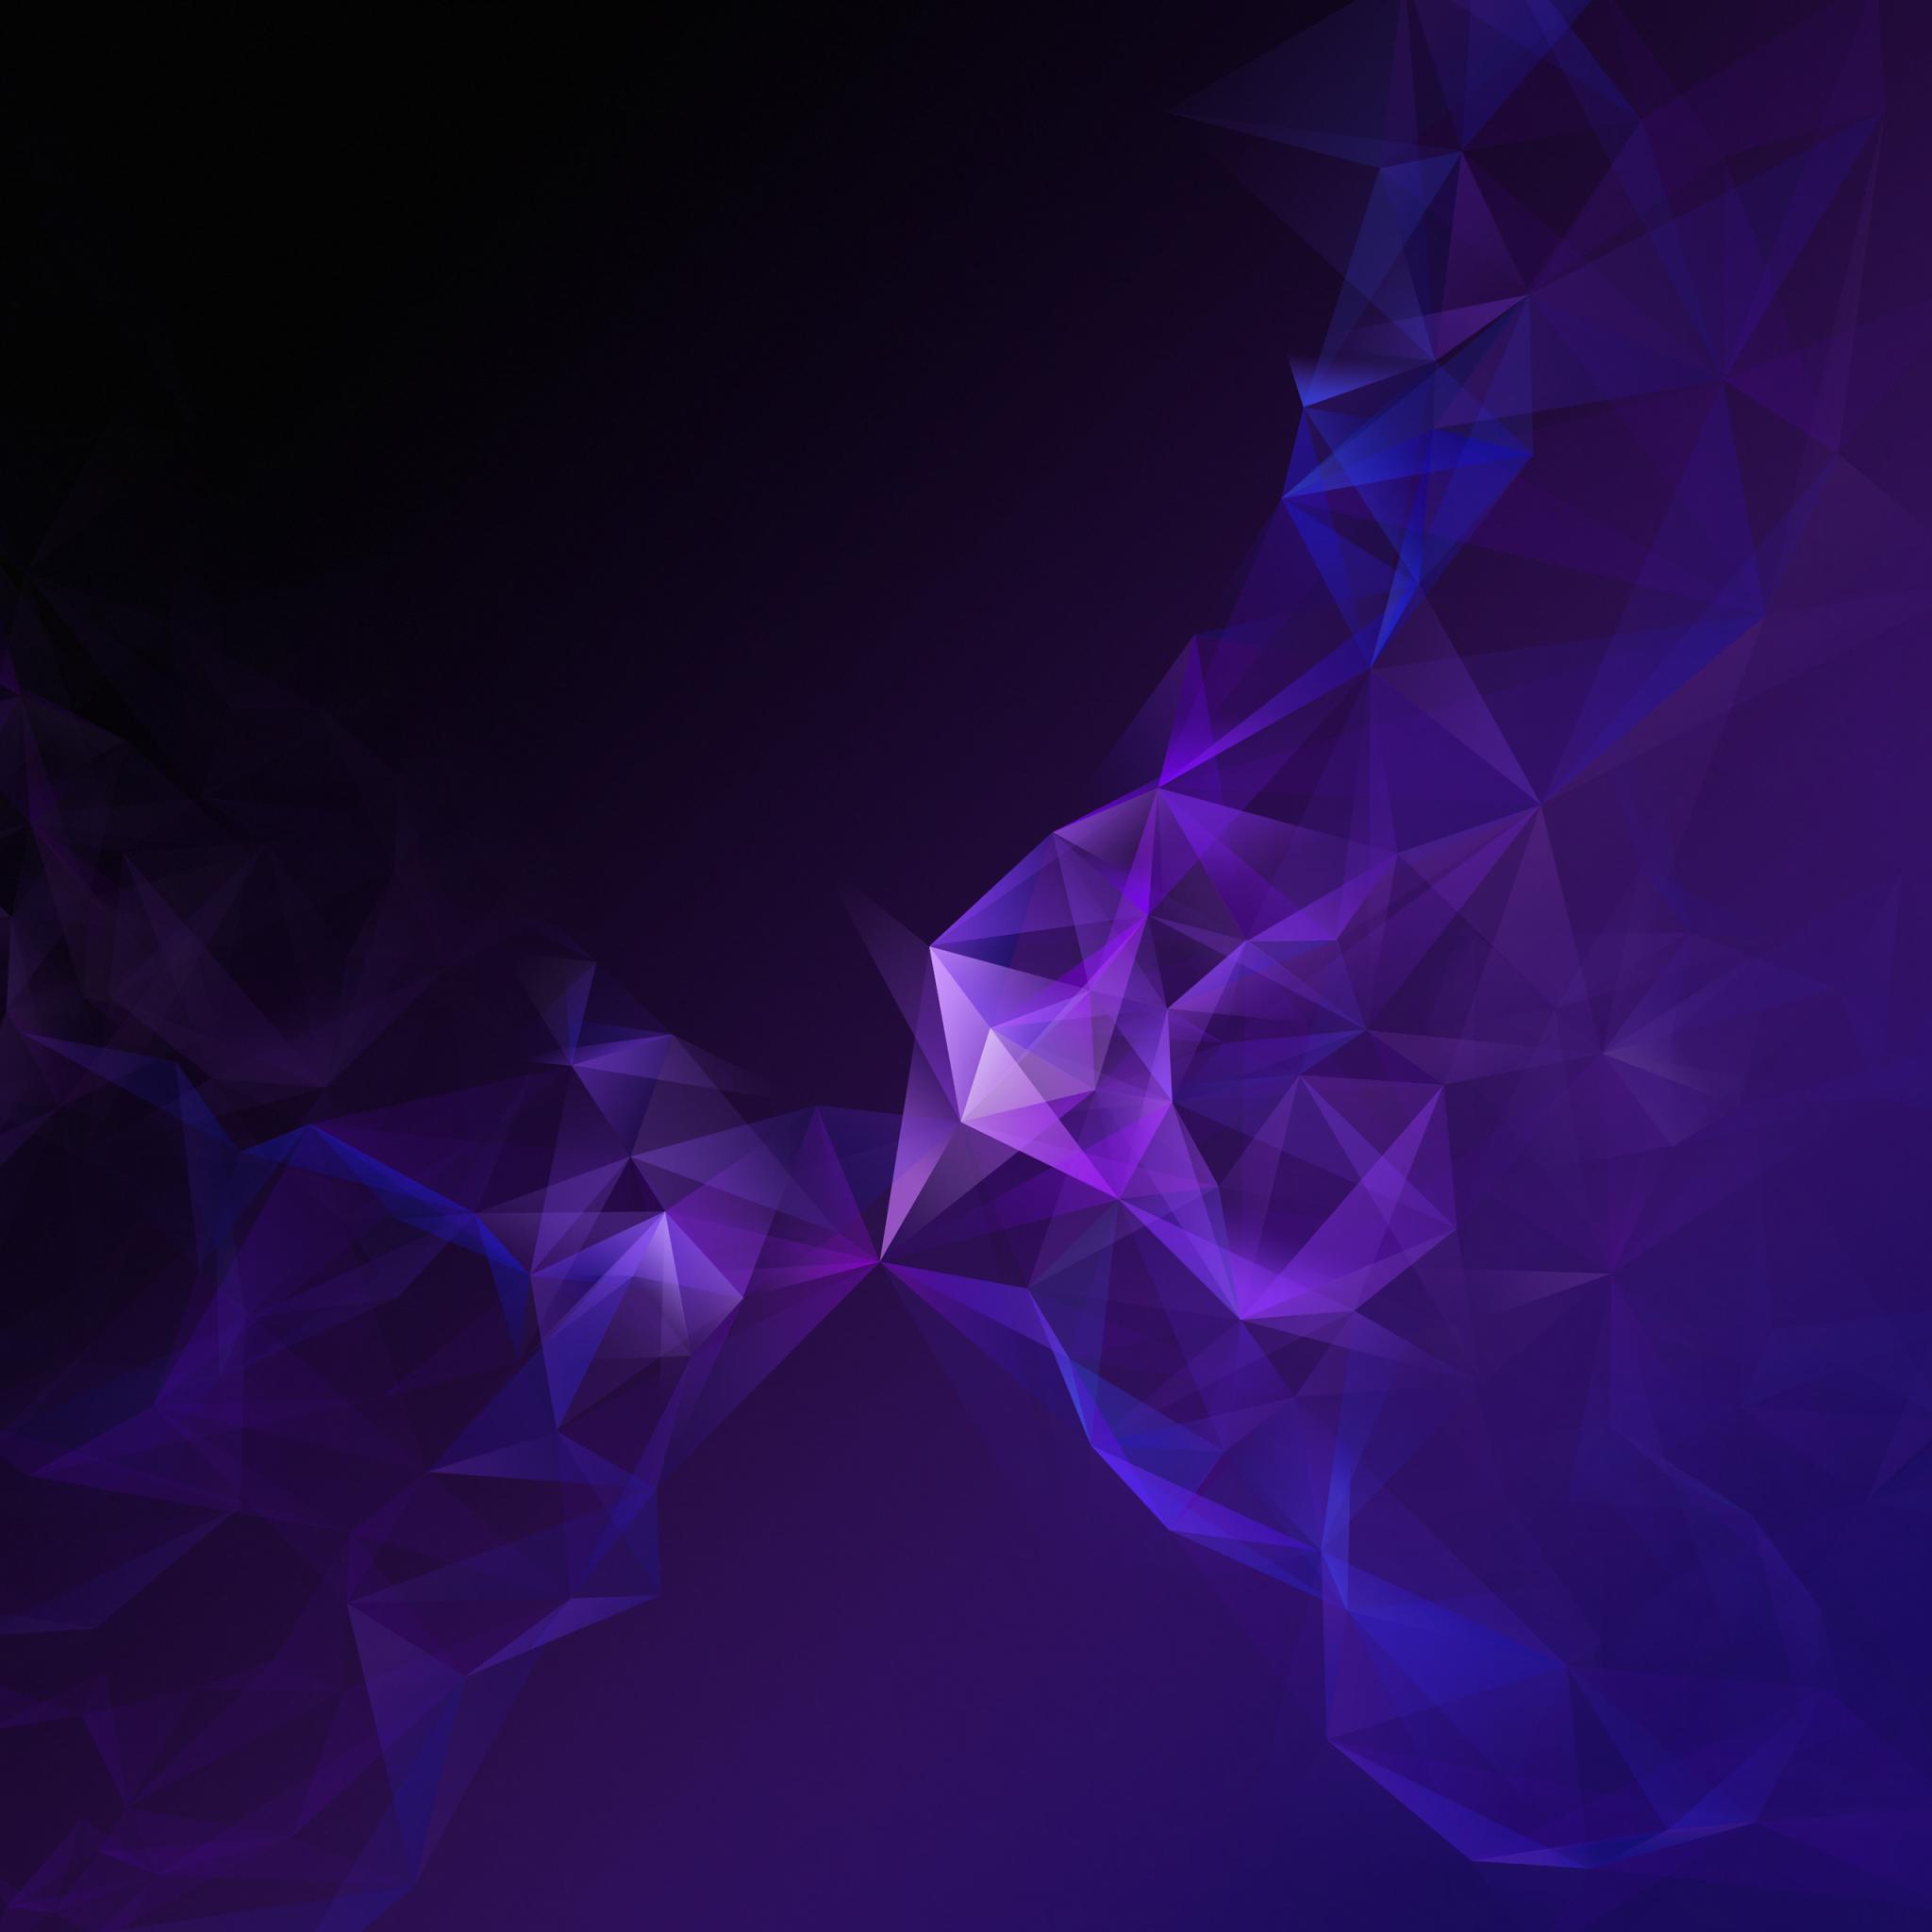 Must see Wallpaper Home Screen Xperia - Galaxy-s9-wallpaper-18-techfoogle  HD_449824.png?w\u003d300